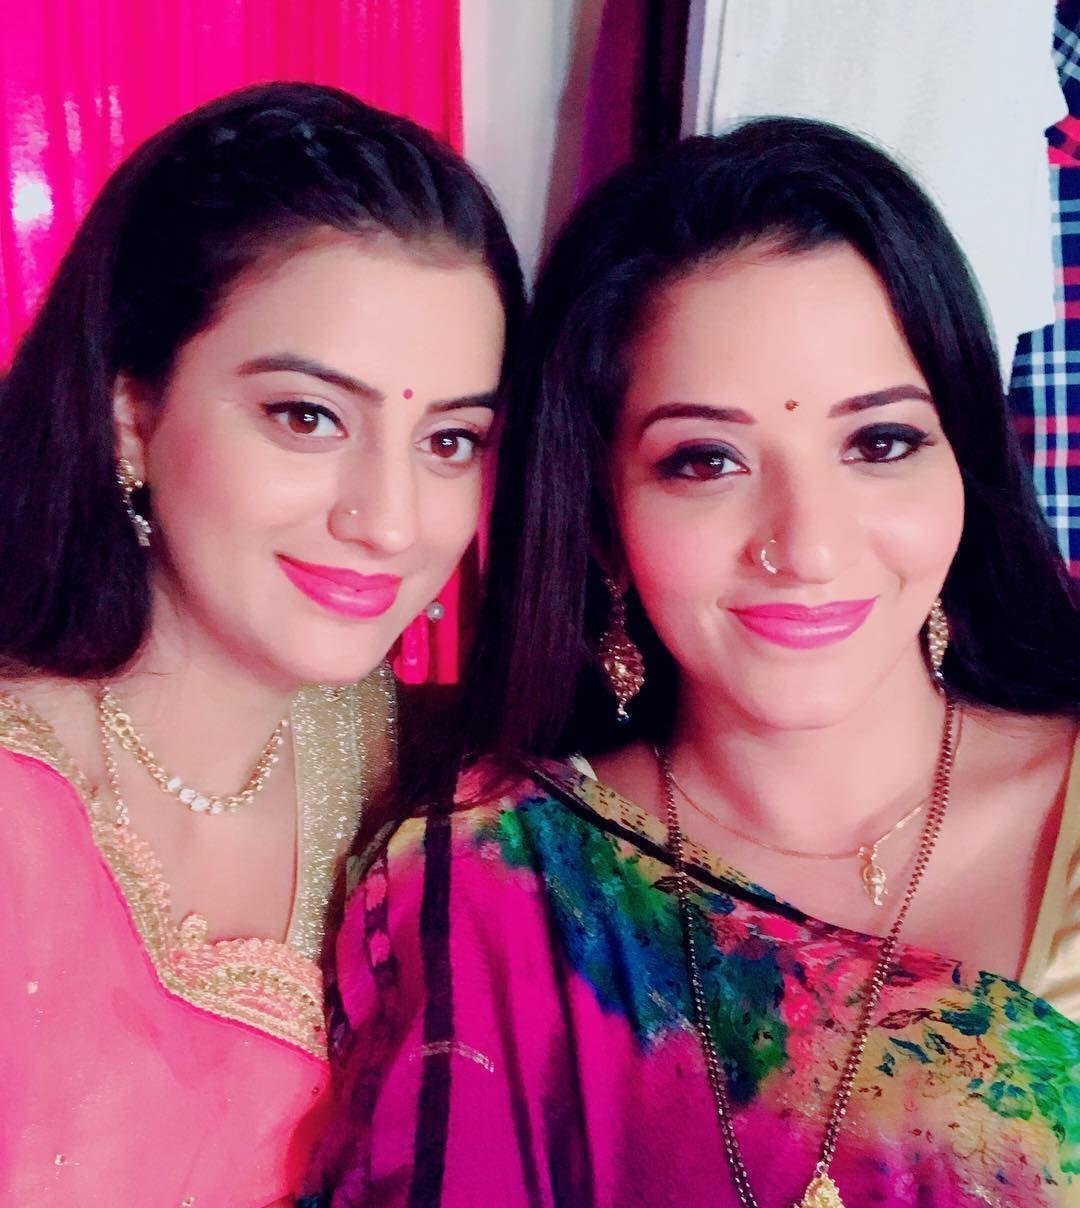 People Says We Look Like We Are Sisters Bhojpuri Actress